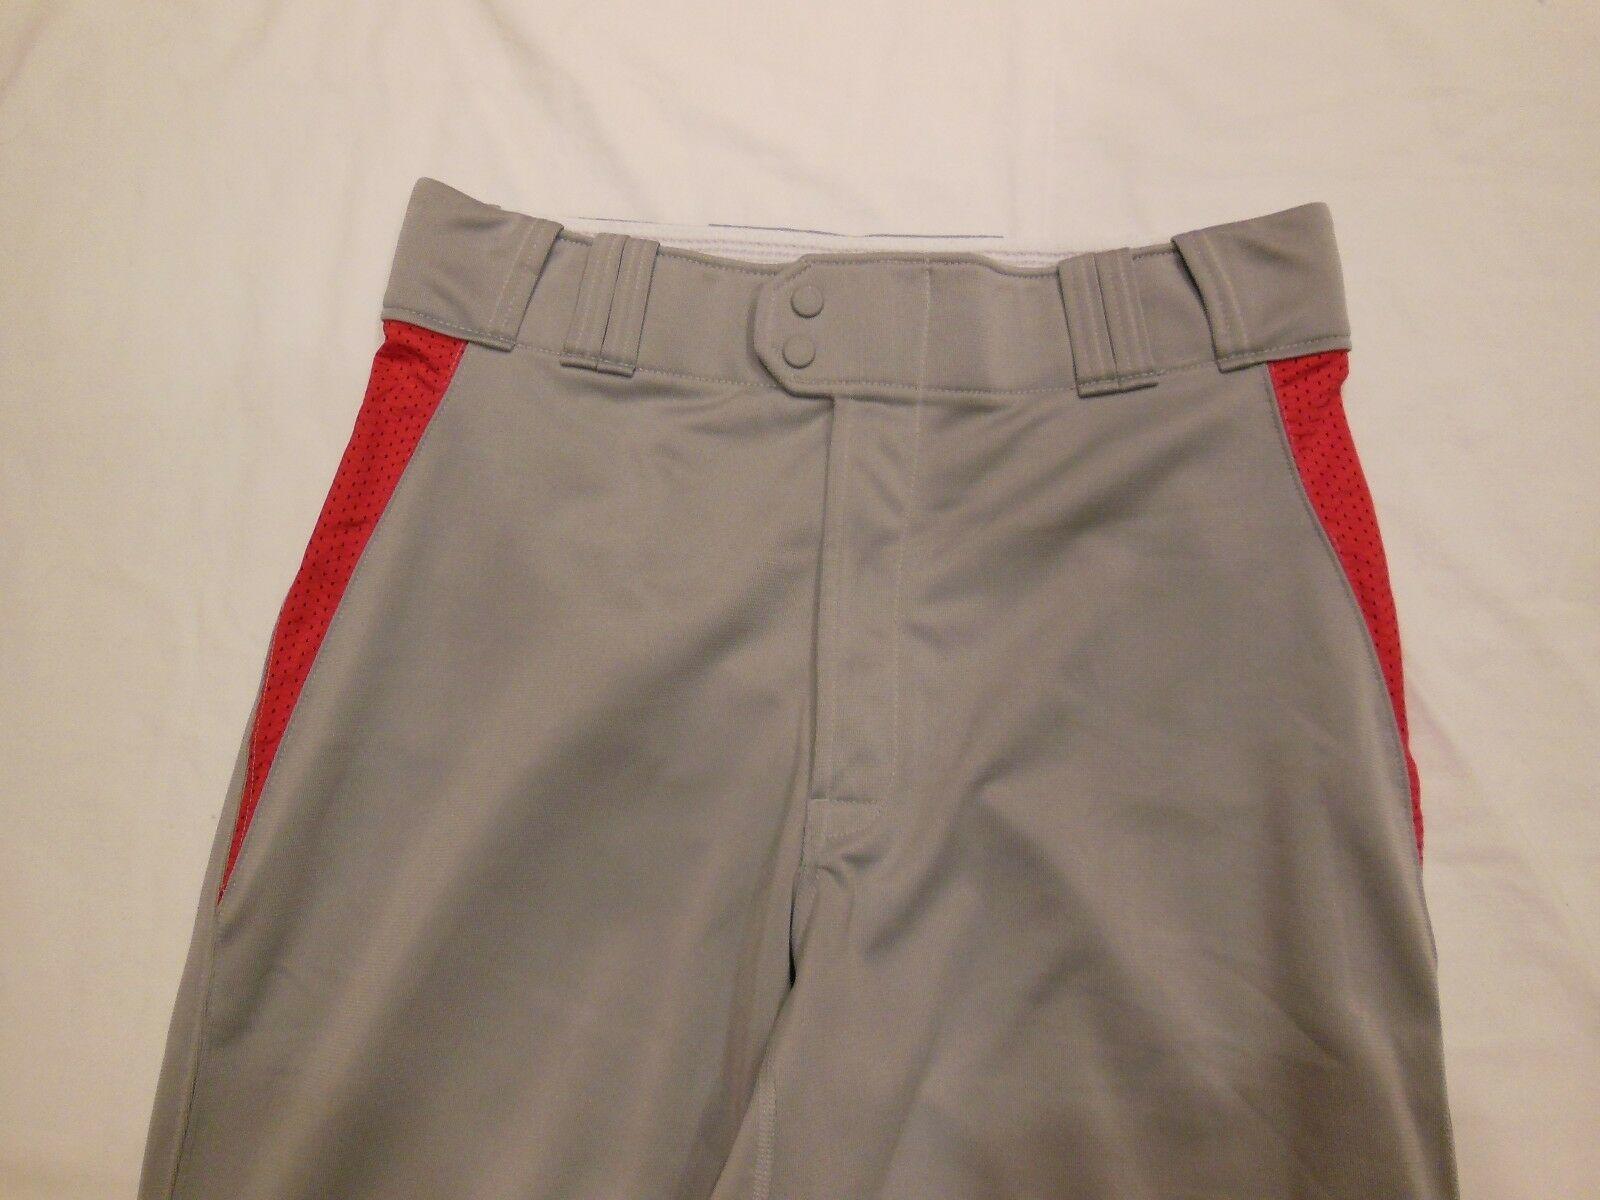 MENS NWT RAWLINGS XXL 2XL PINSTRIPE BASEBALL PANTS GRAY RED BRAND NEW